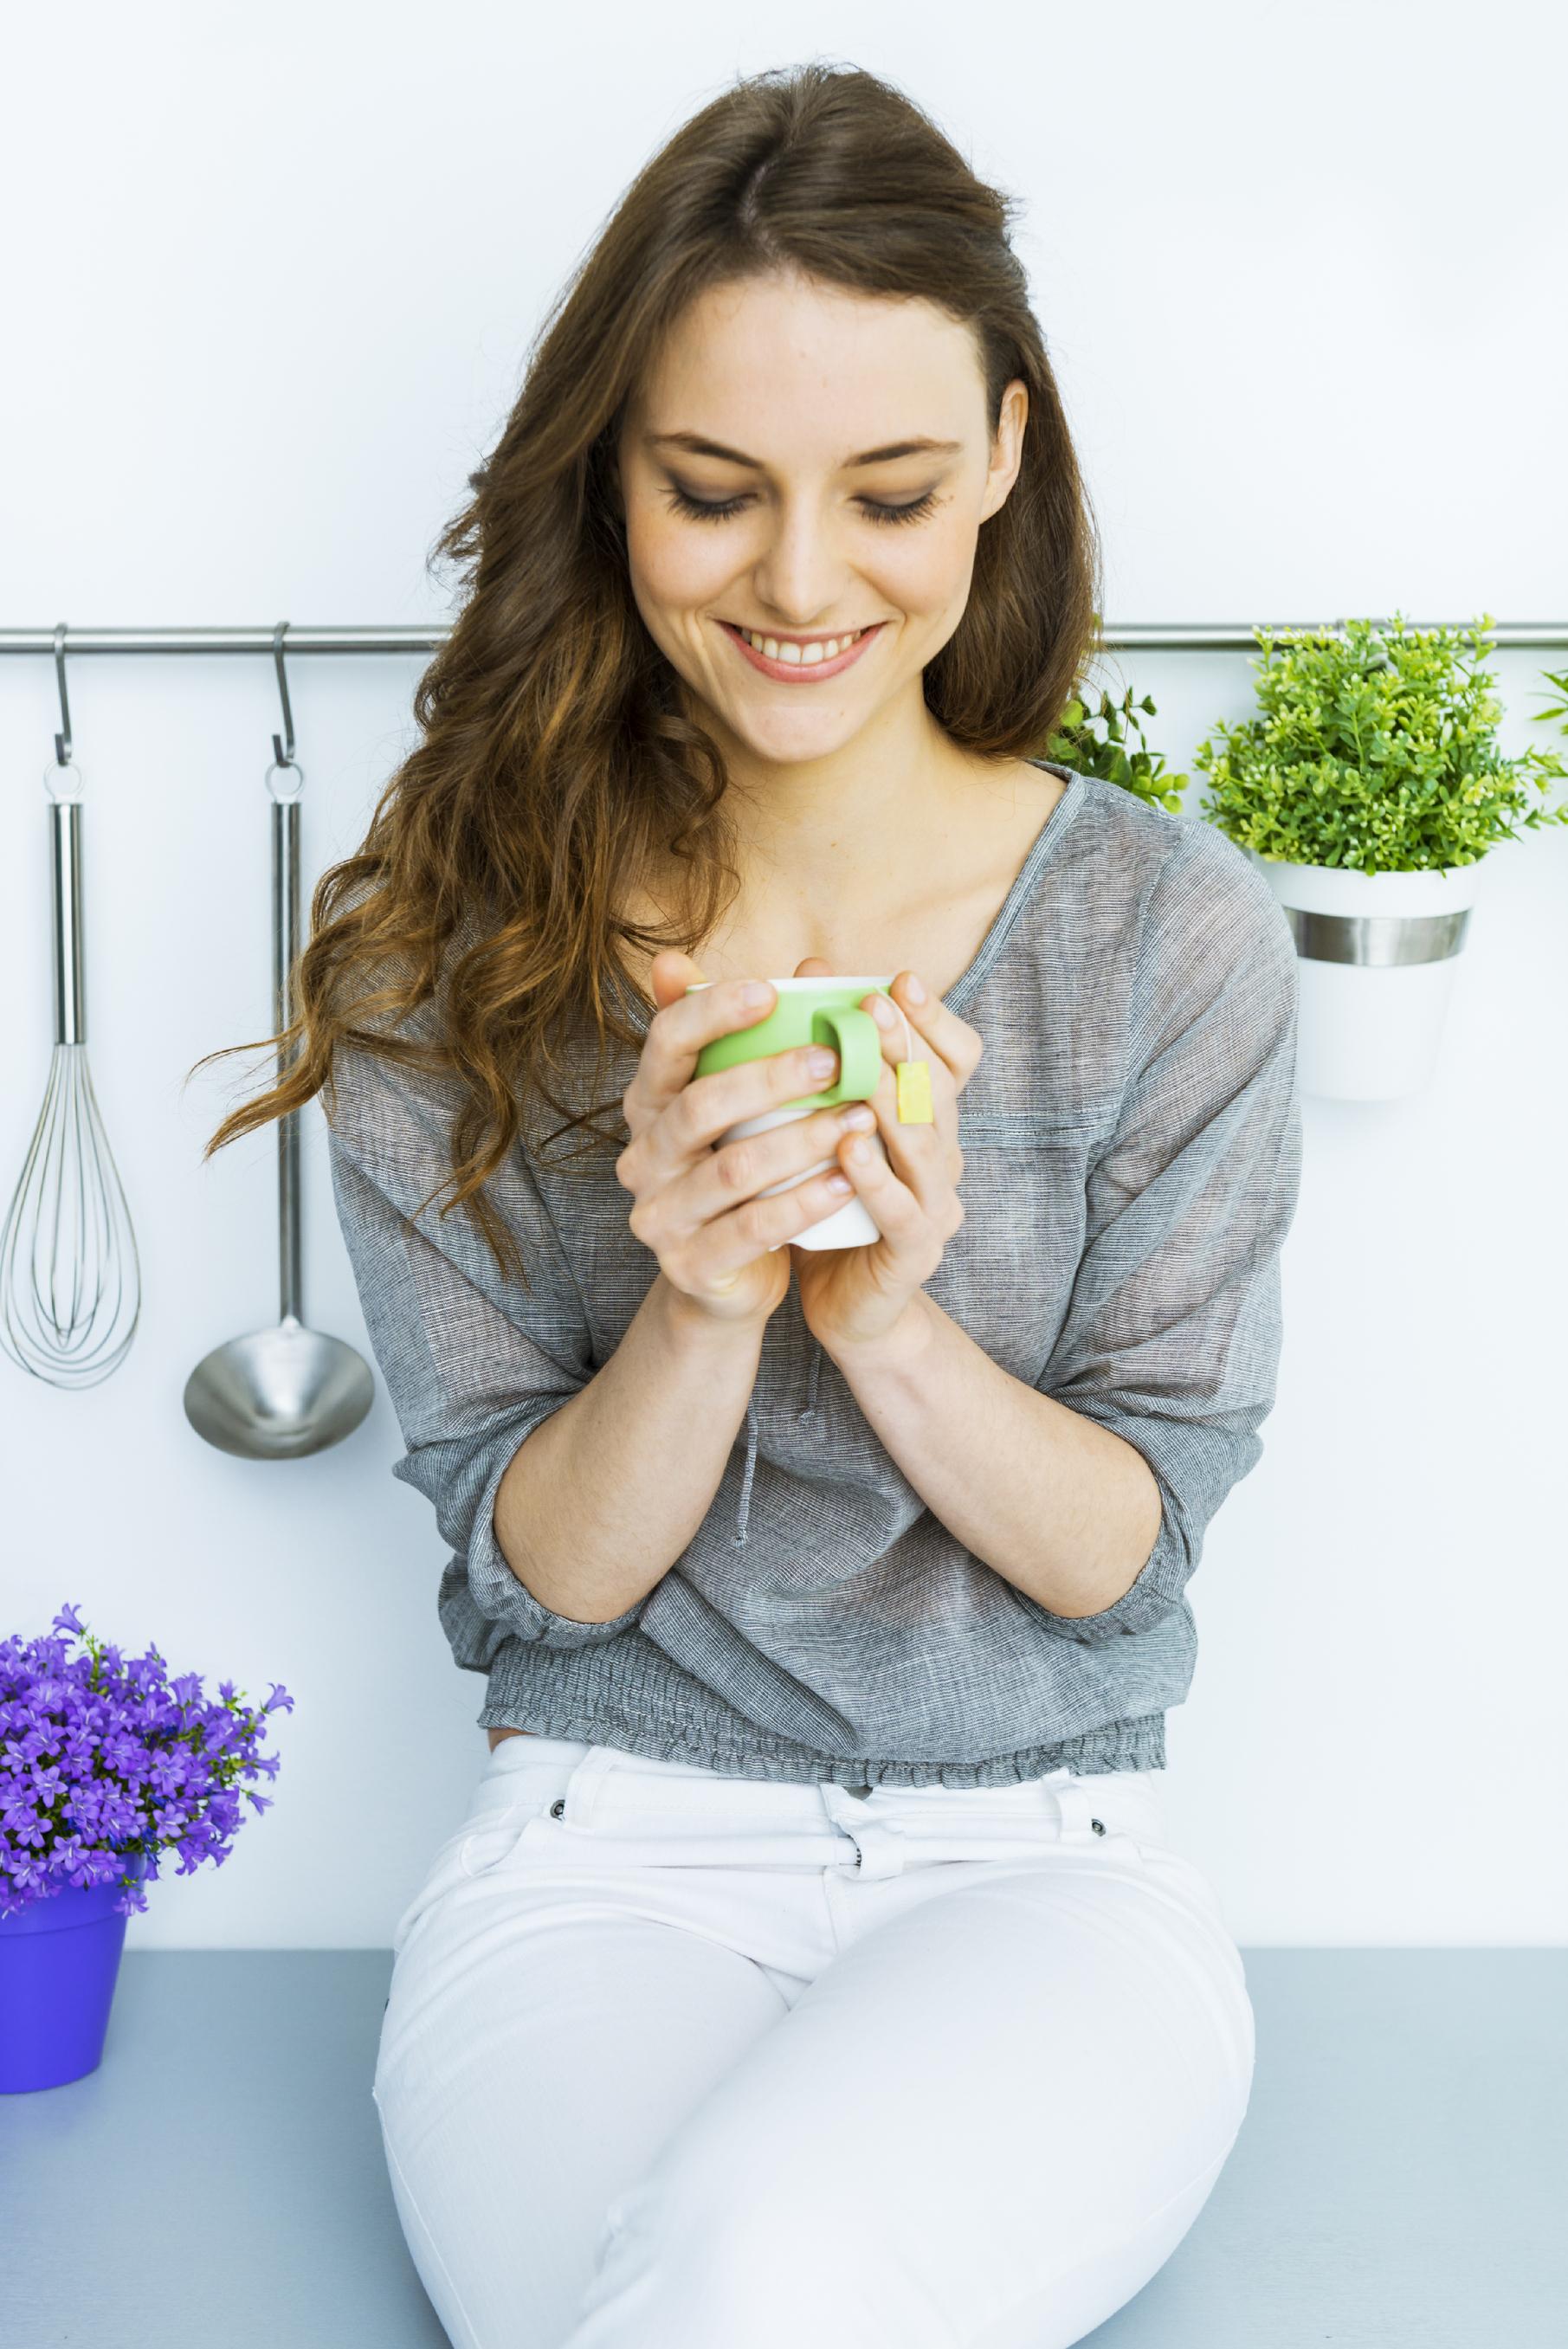 How green tea improves oral health